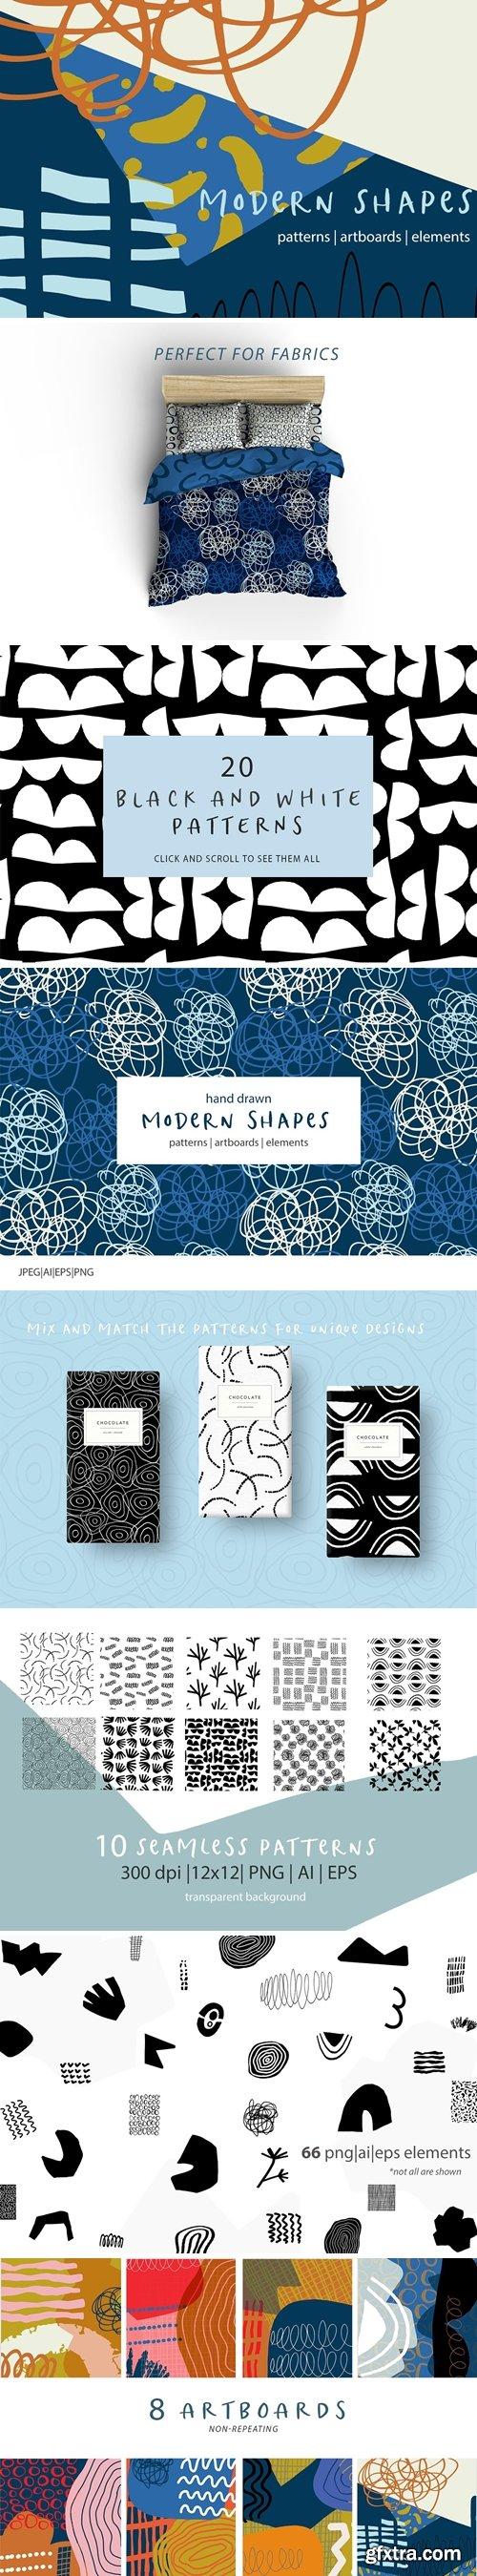 CM - Modern Shapes Patterns & Artboards 3529308